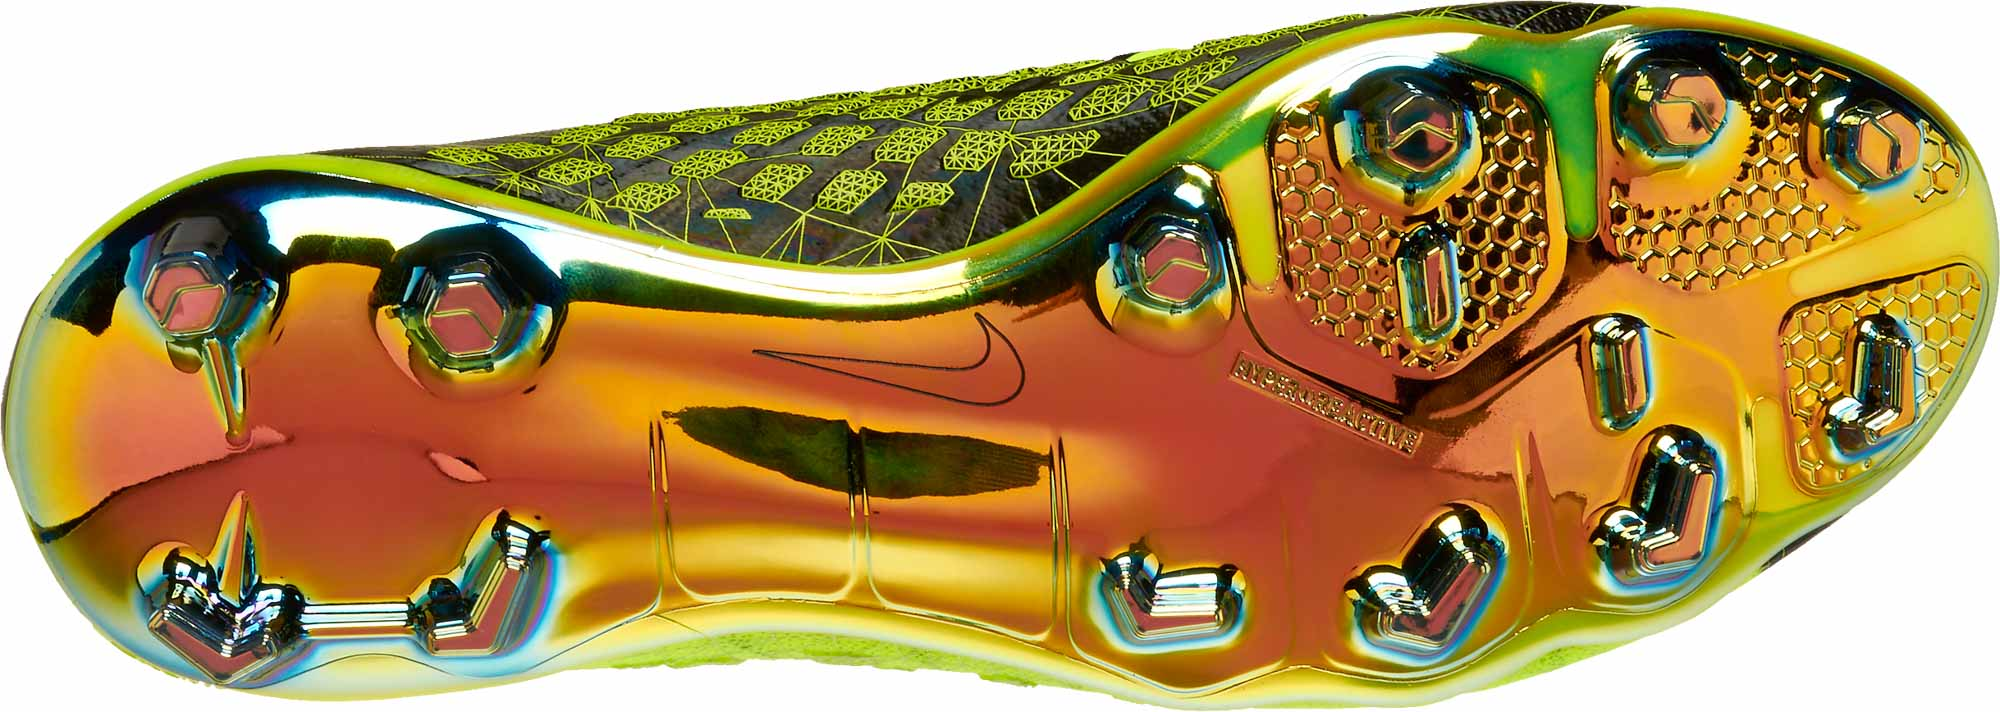 075dc6805e4 Nike Hypervenom Phantom III DF FG – EA Sports – Volt Black